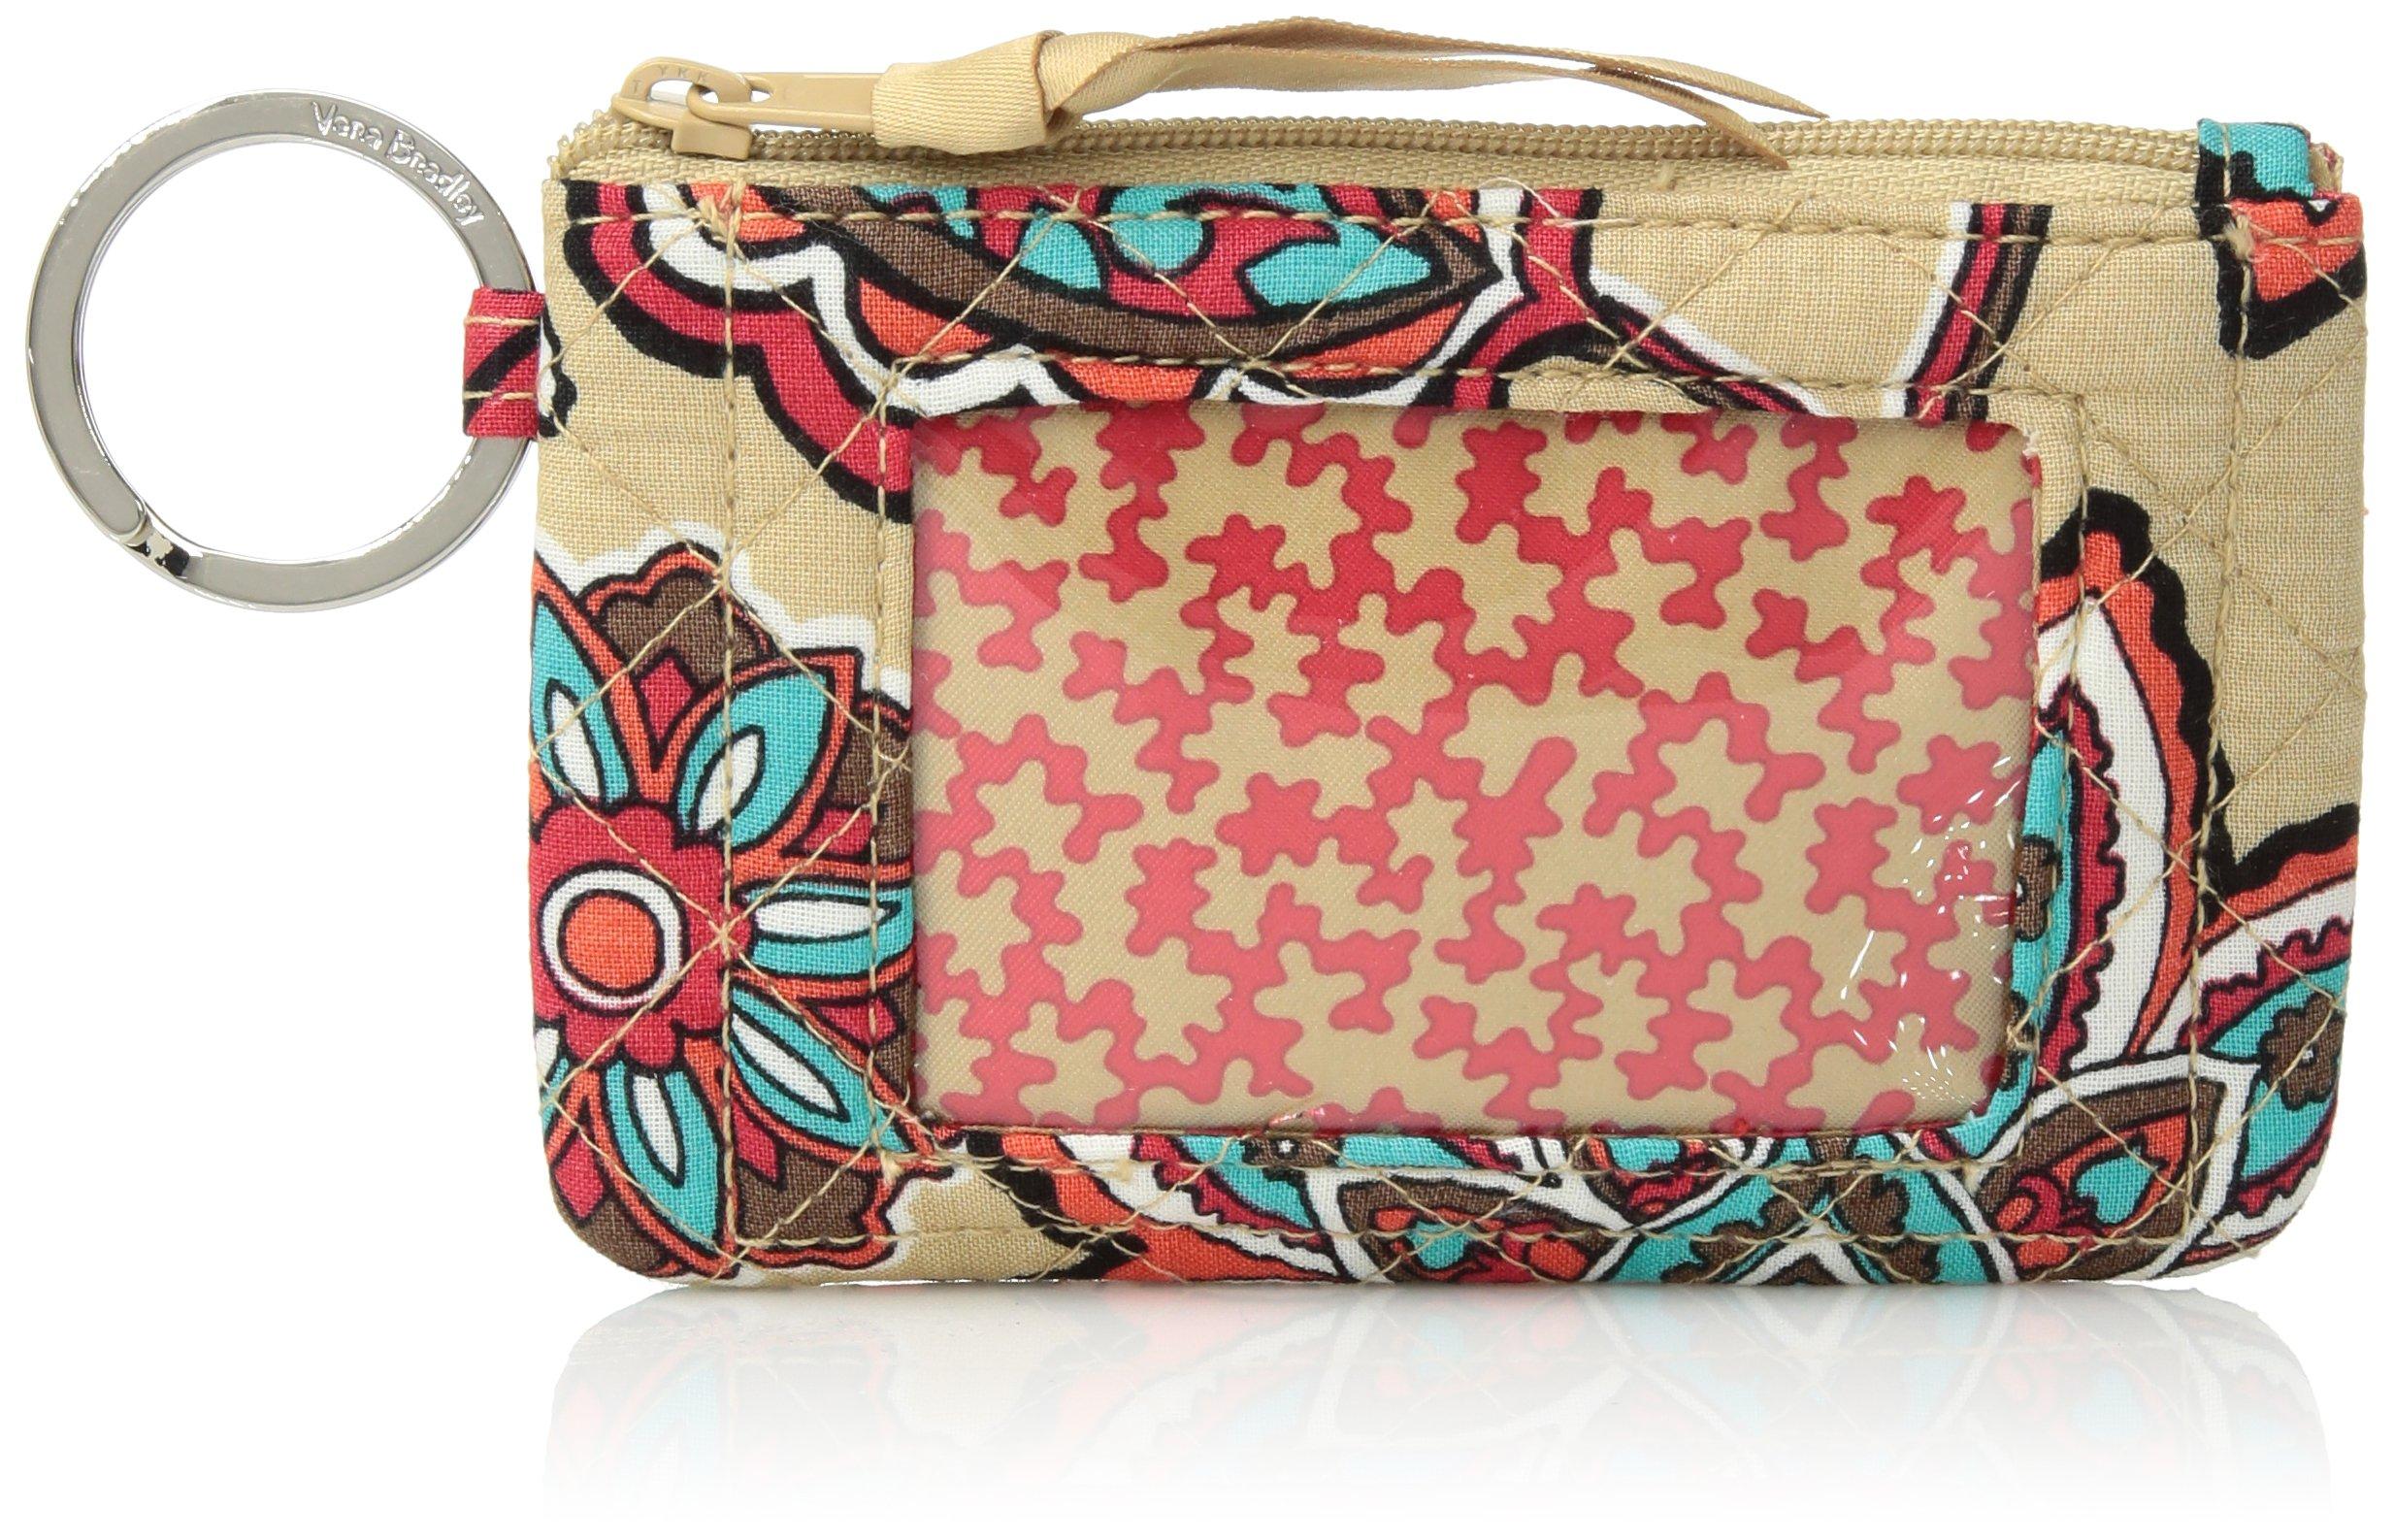 Vera Bradley Iconic Zip ID Case, Signature Cotton, Desert Floral + 1.50 Power